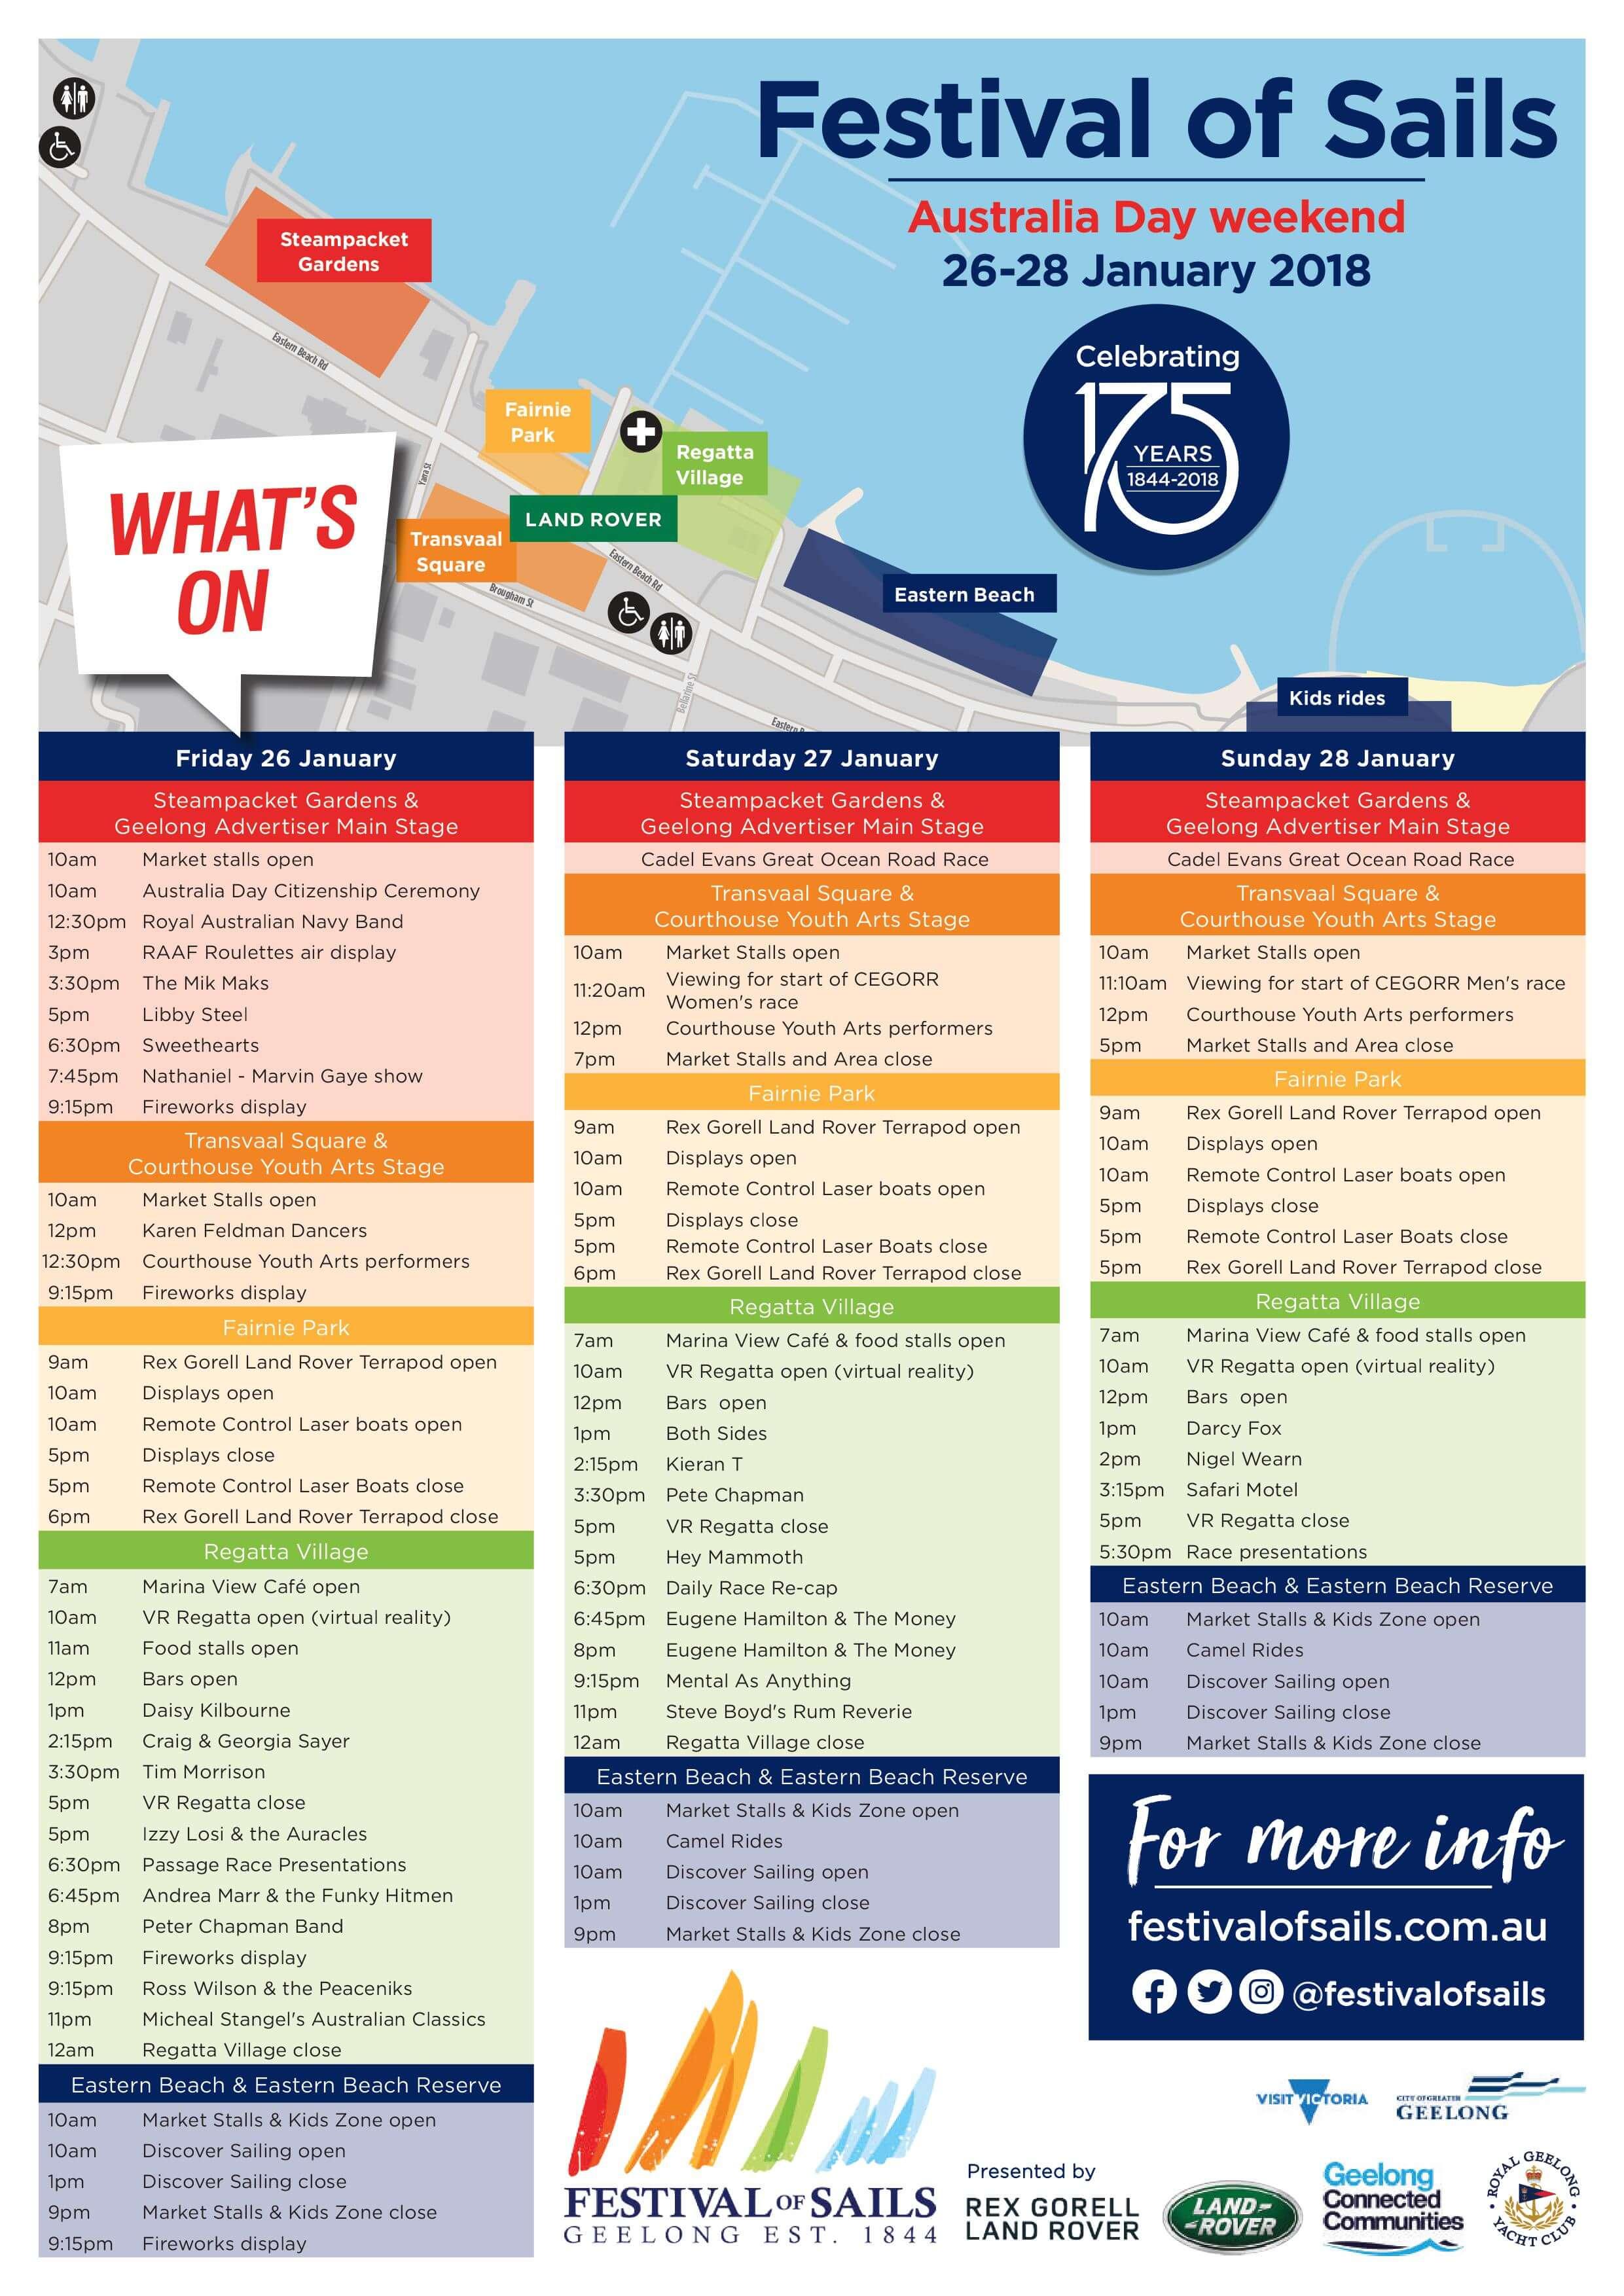 Festival Of Sails event guide